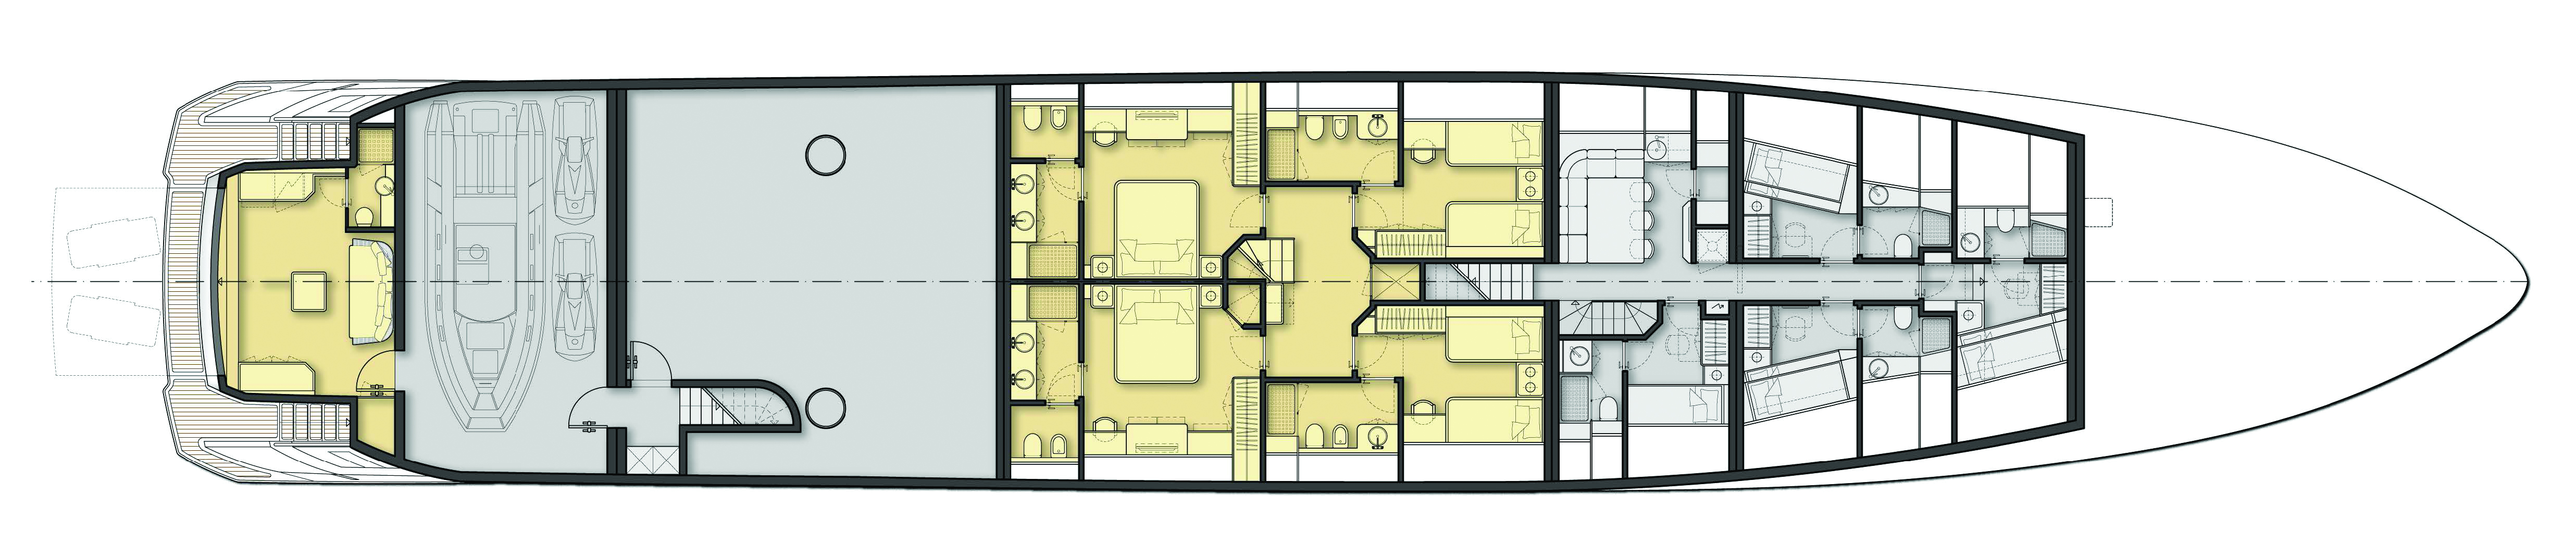 THUNDERBIRD_165_lower deck